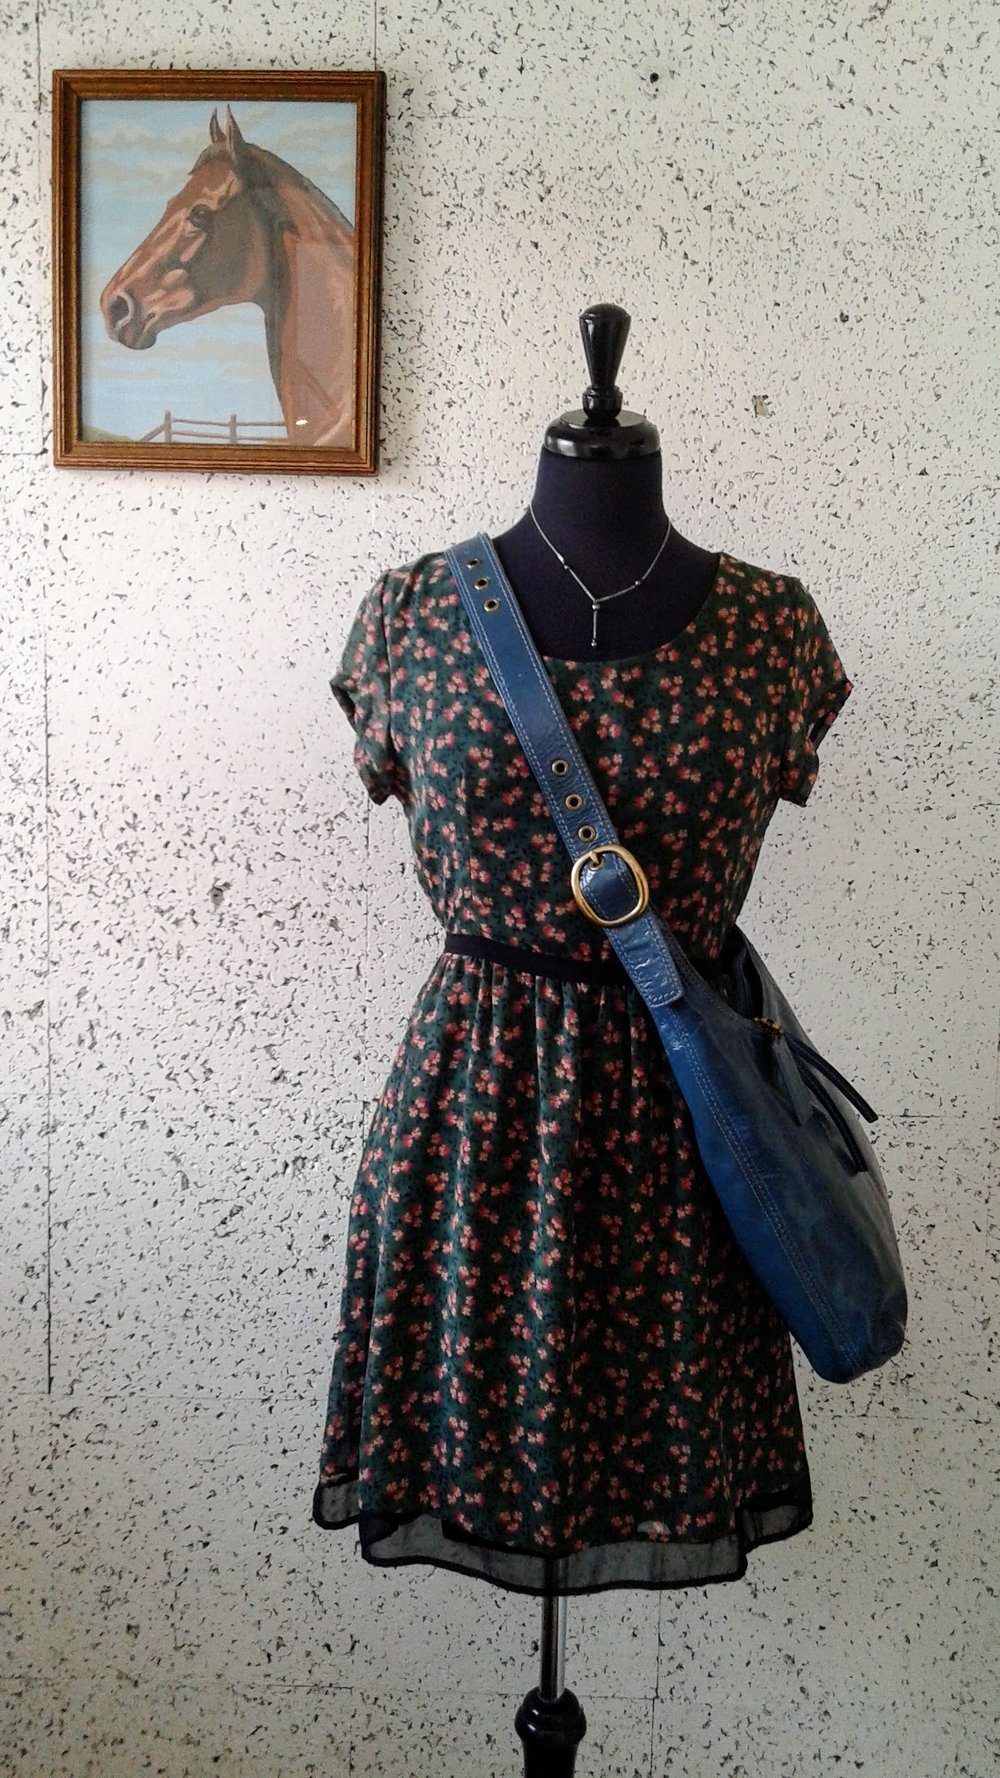 Ezra dress; Size S, $26. Coach bag, $48